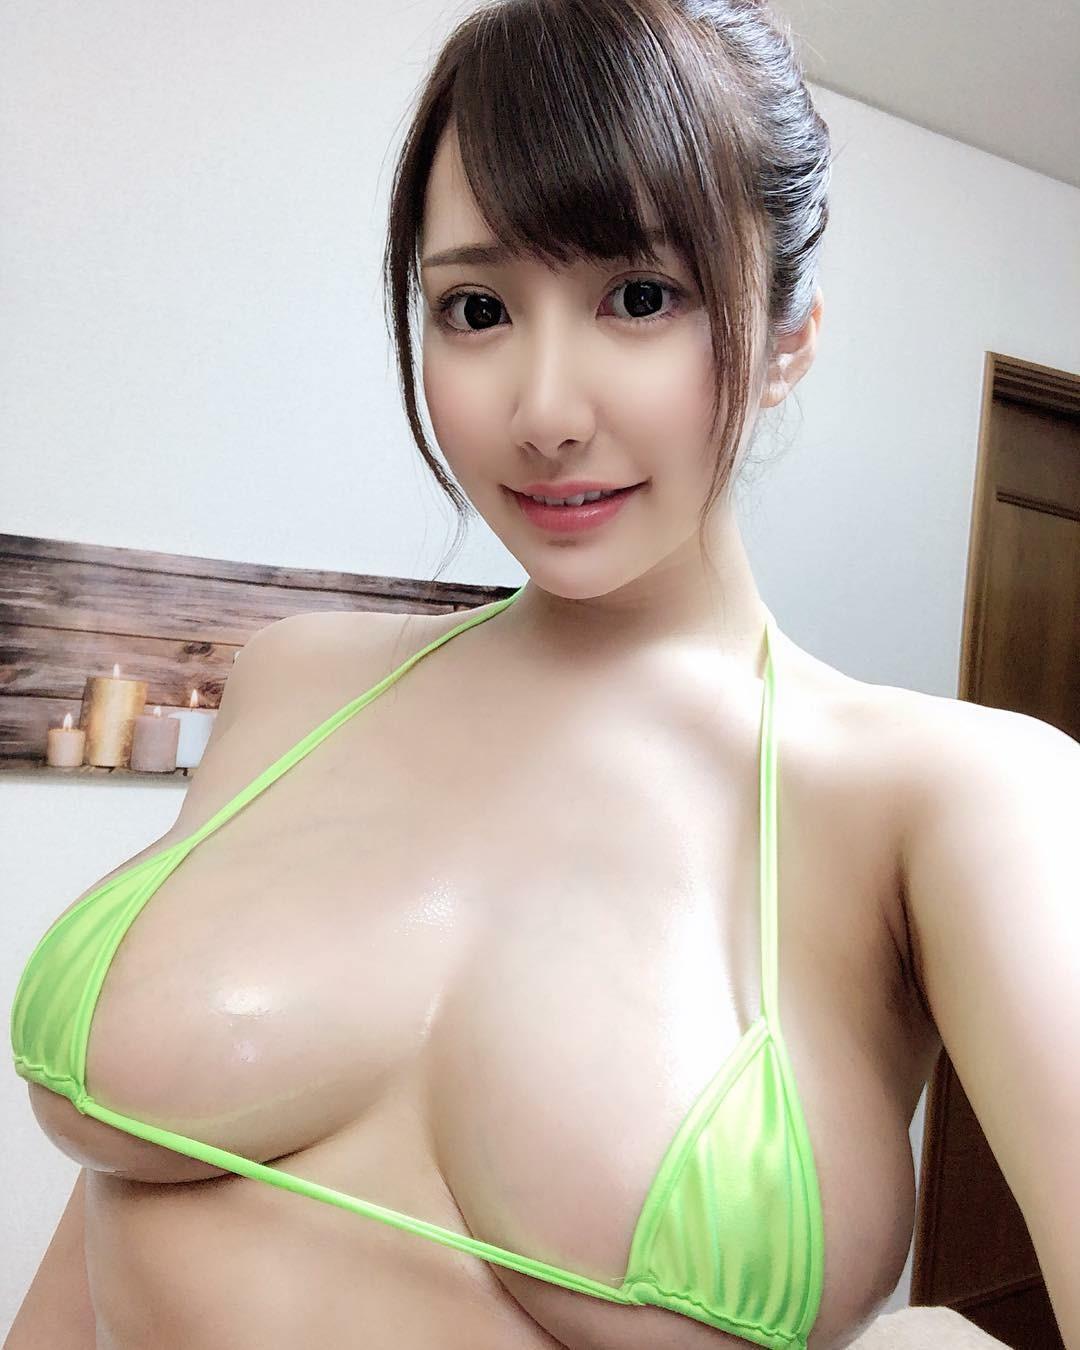 Ara Mina Naked Body mina wakatsuki porn pic - eporner